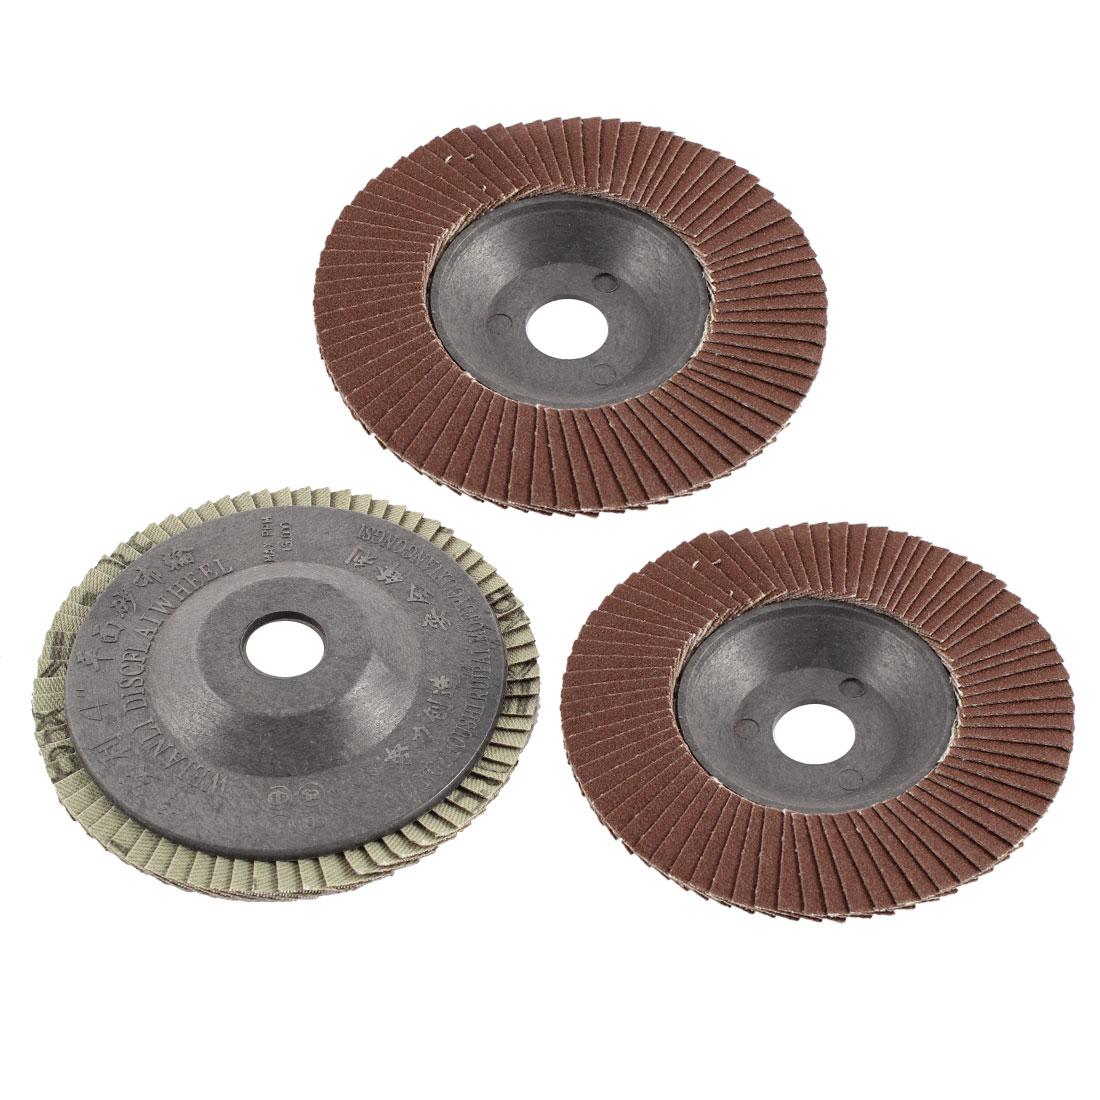 "3pcs 4"" x 5/8"" Zirconium Oxide Flap Sanding Discs Polish Grinding Wheel 320 Grit"